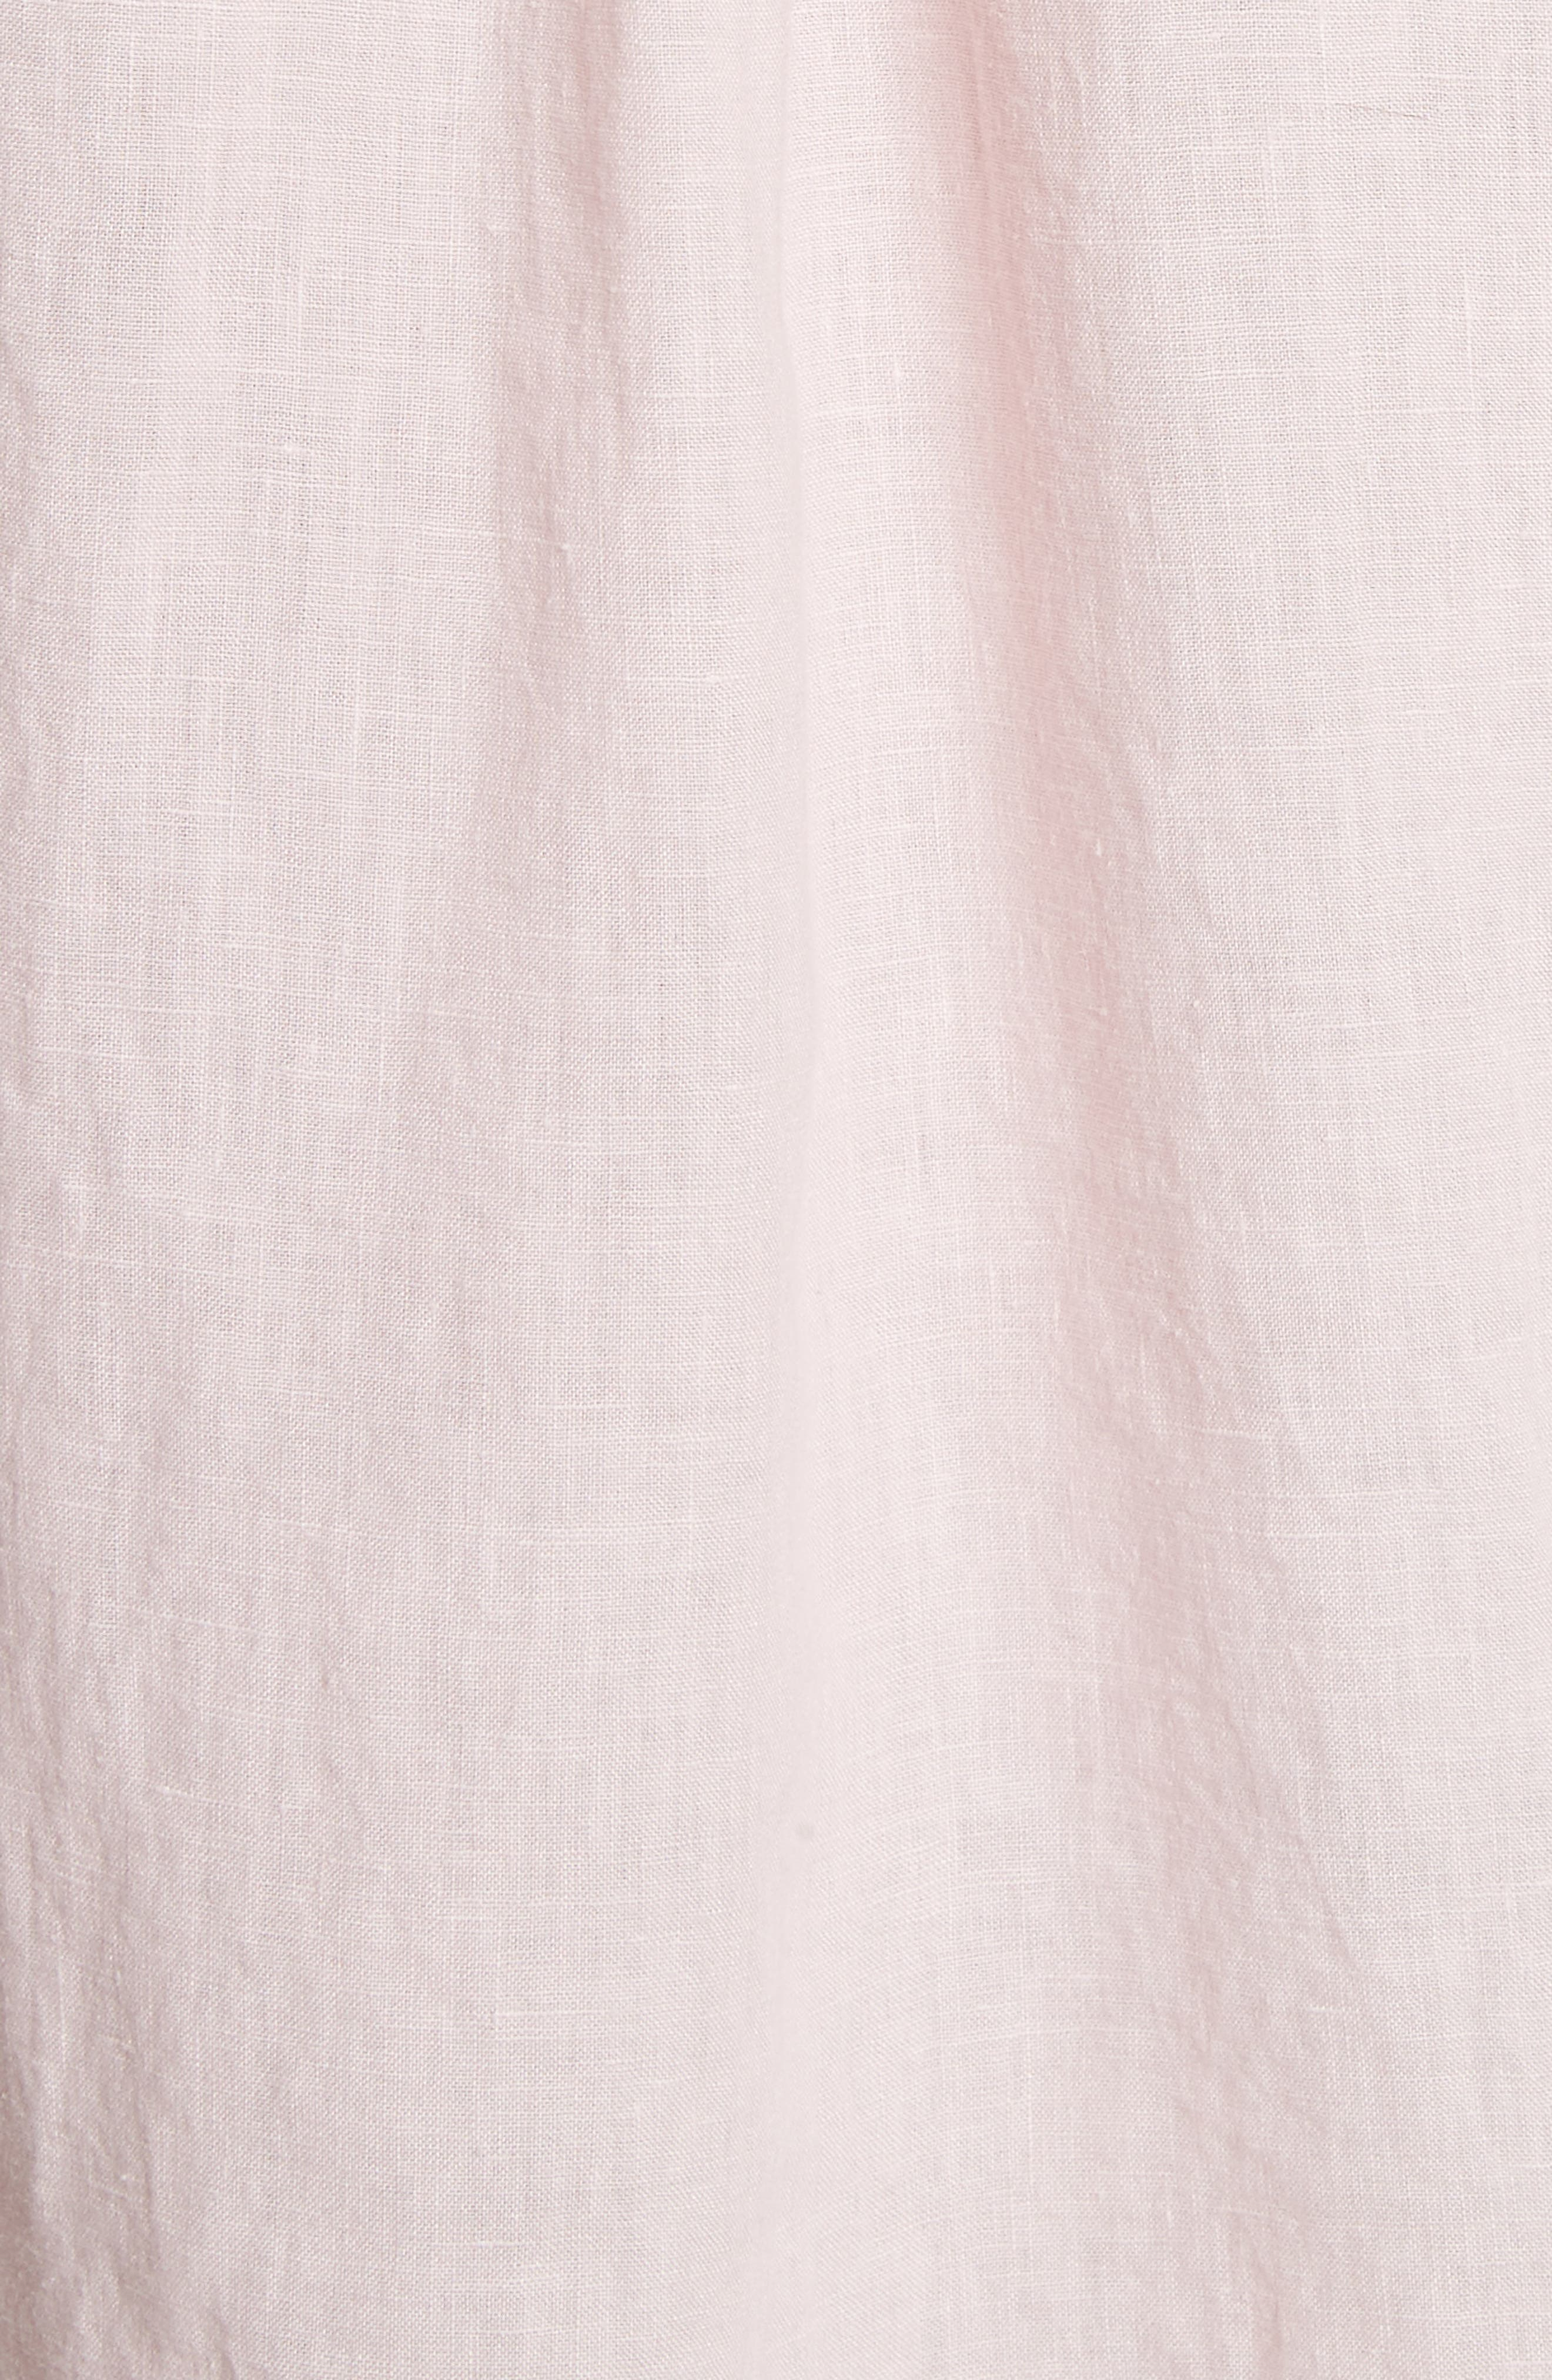 Linen Woven Shirt,                             Alternate thumbnail 5, color,                             Pink